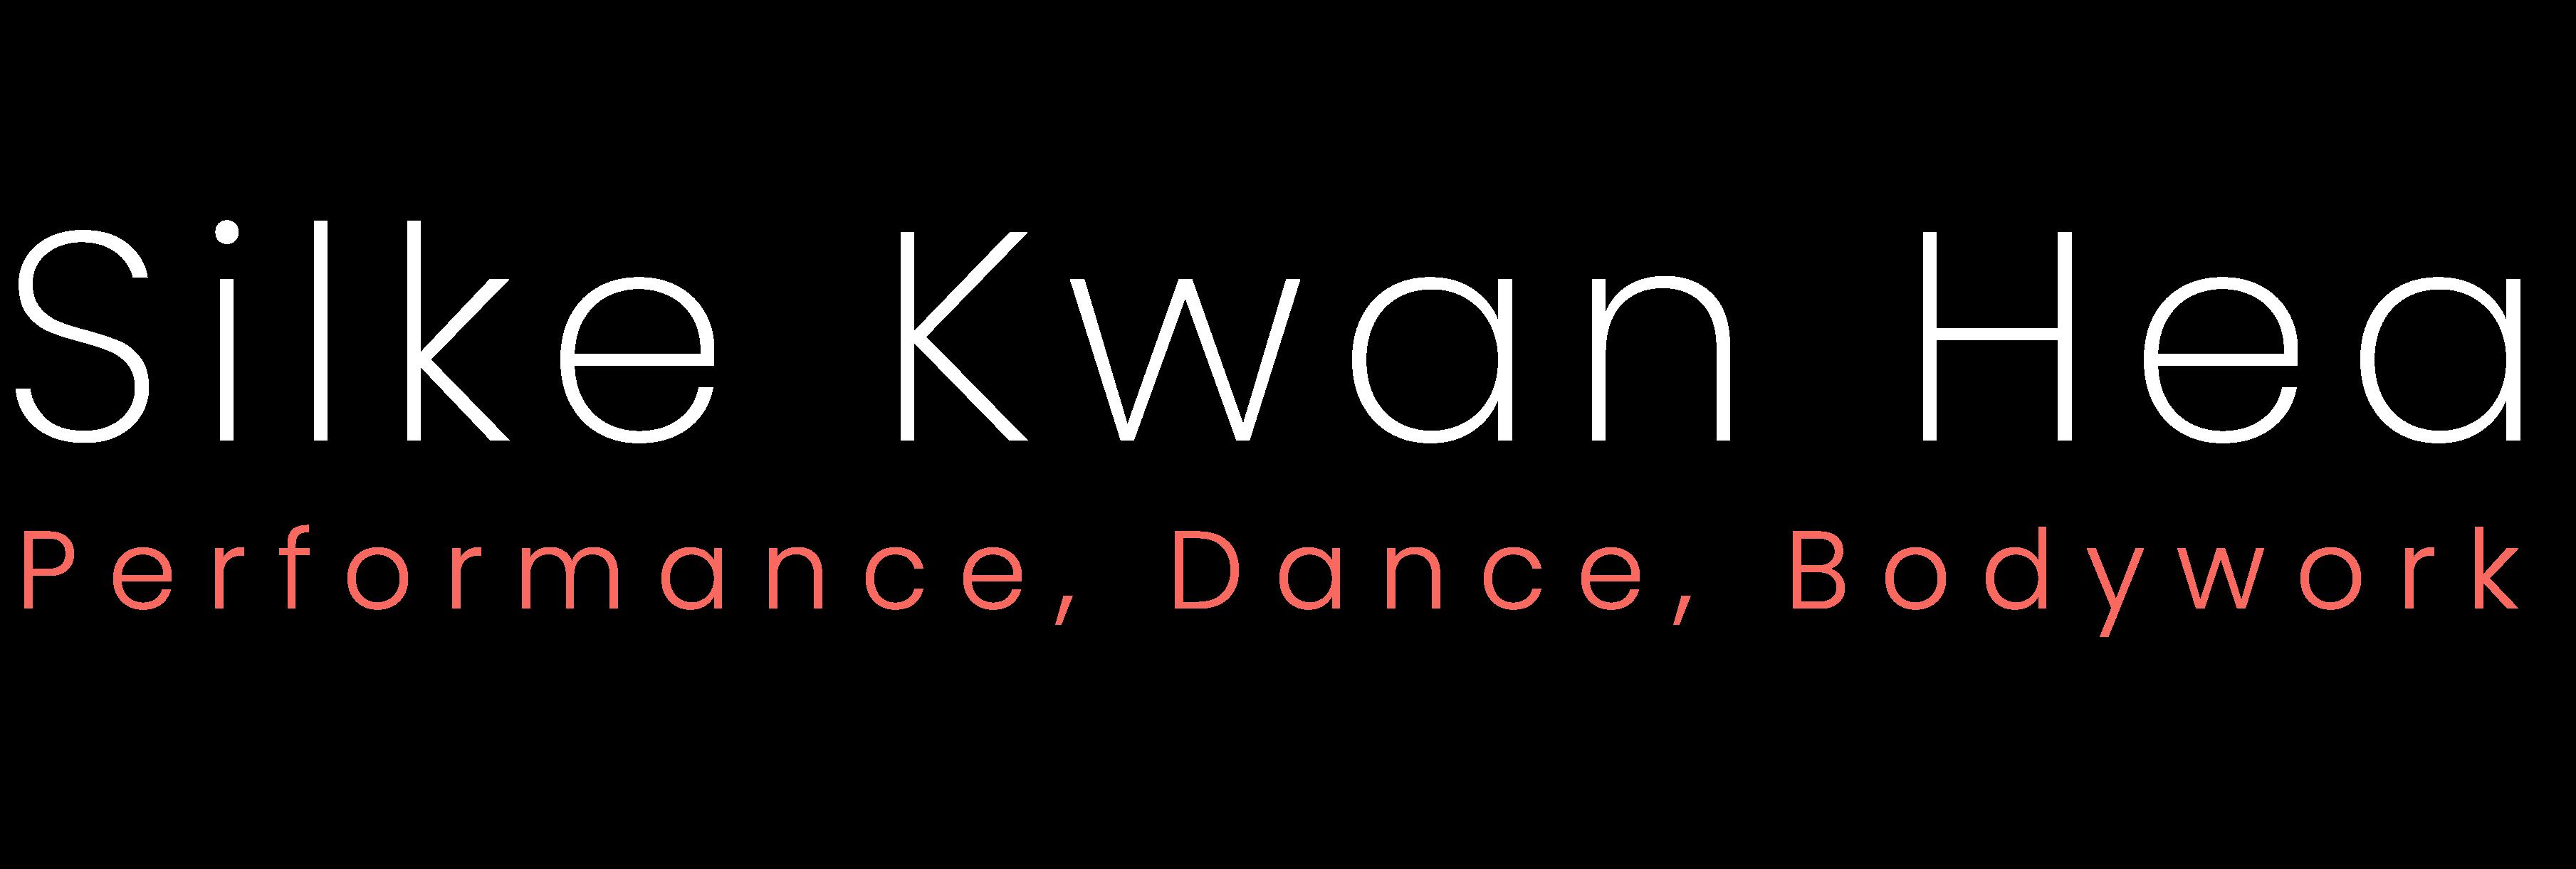 Futuristicdance